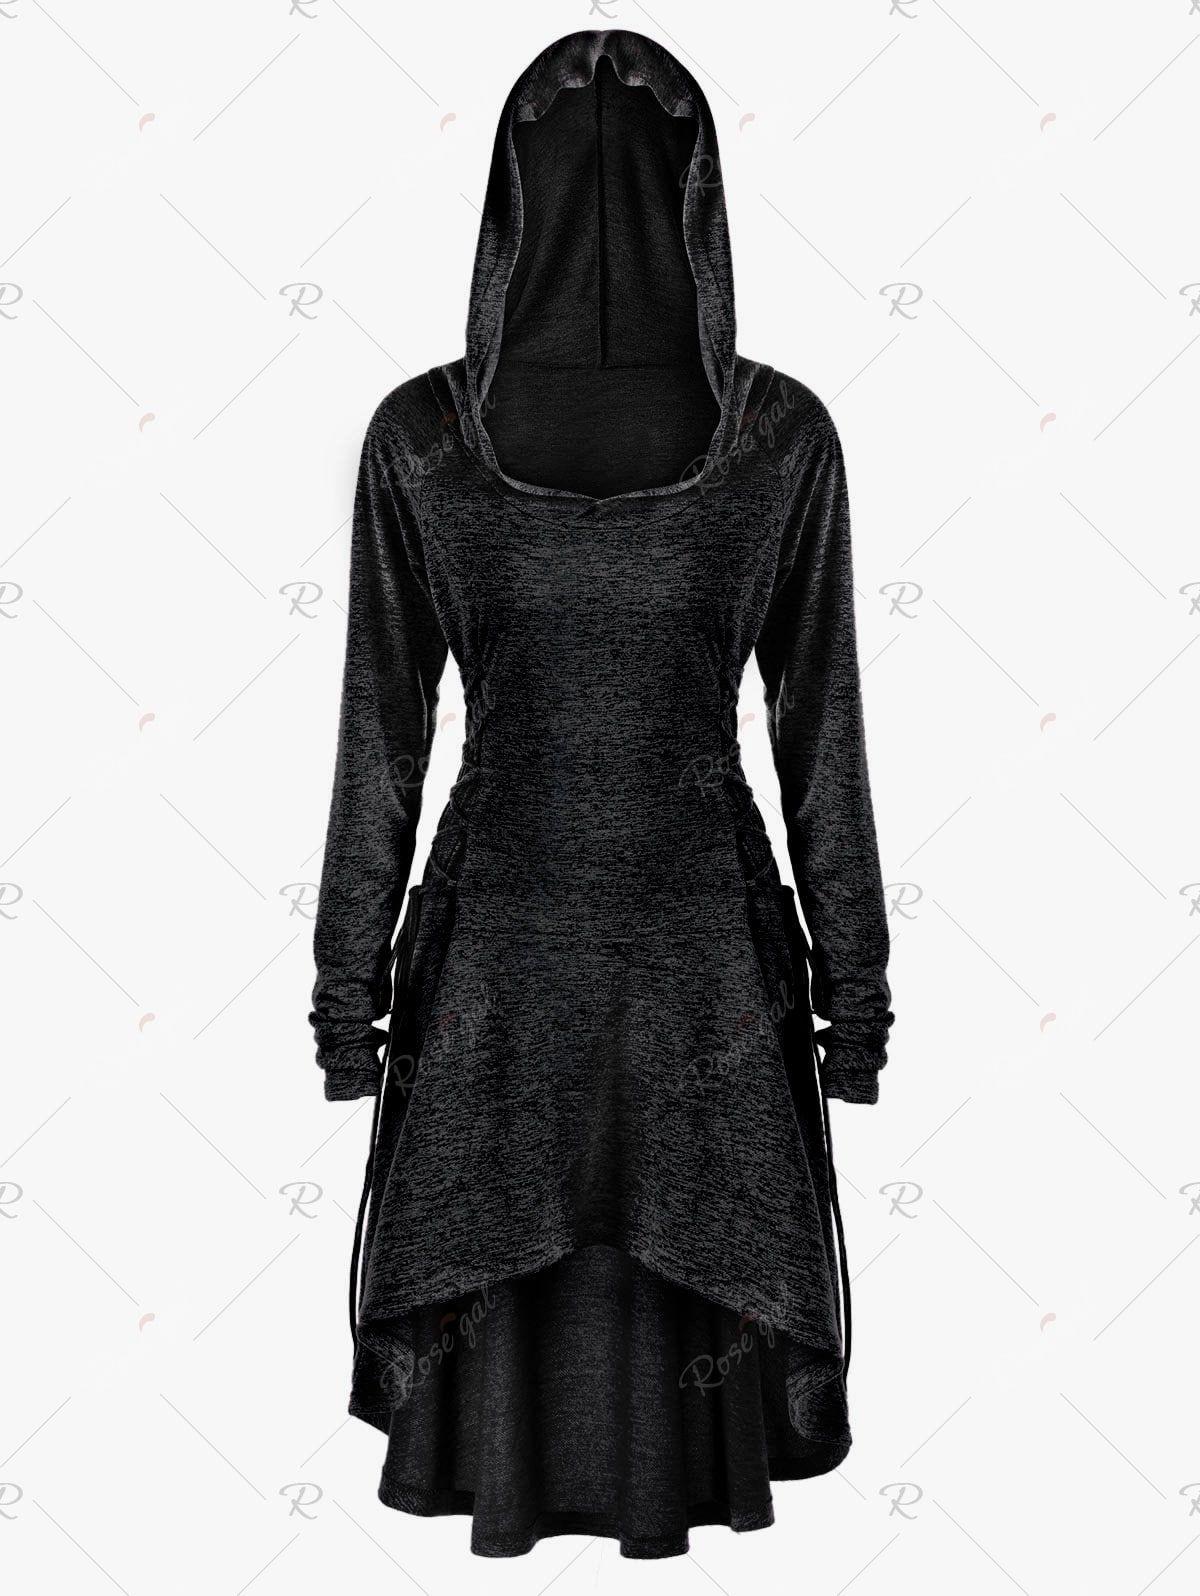 6401797f339 Halloween Plus Size Lace Up Marled Dip Hem Hoodie